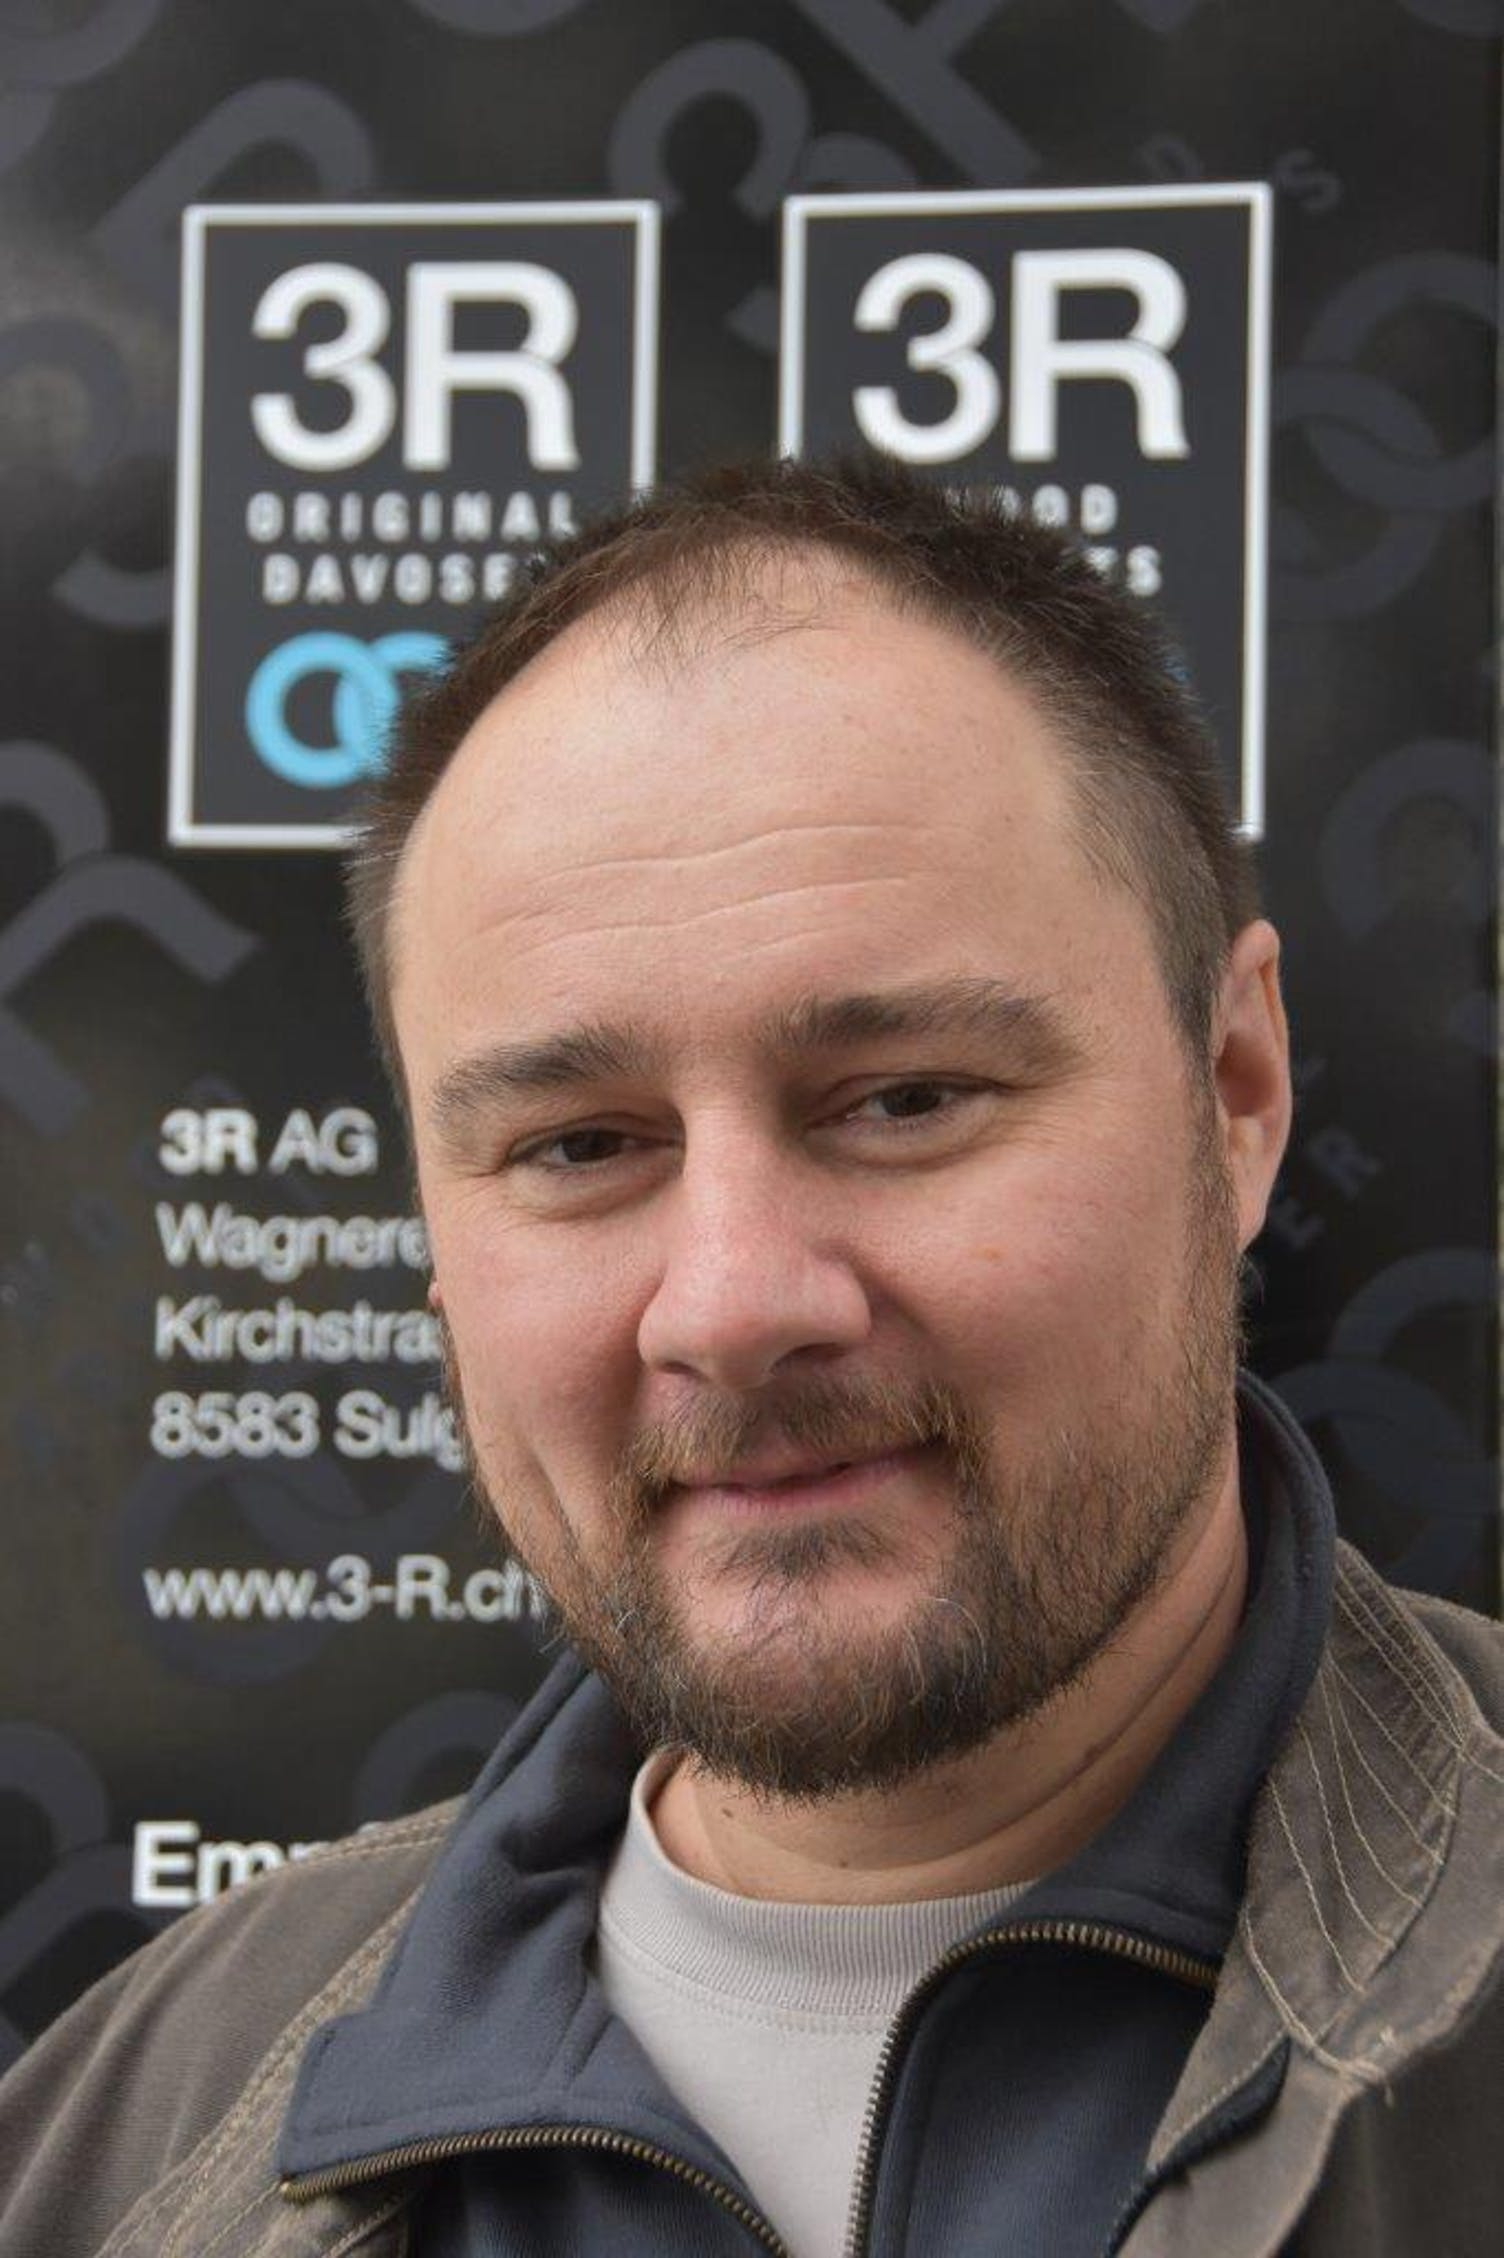 Erwin Dreier